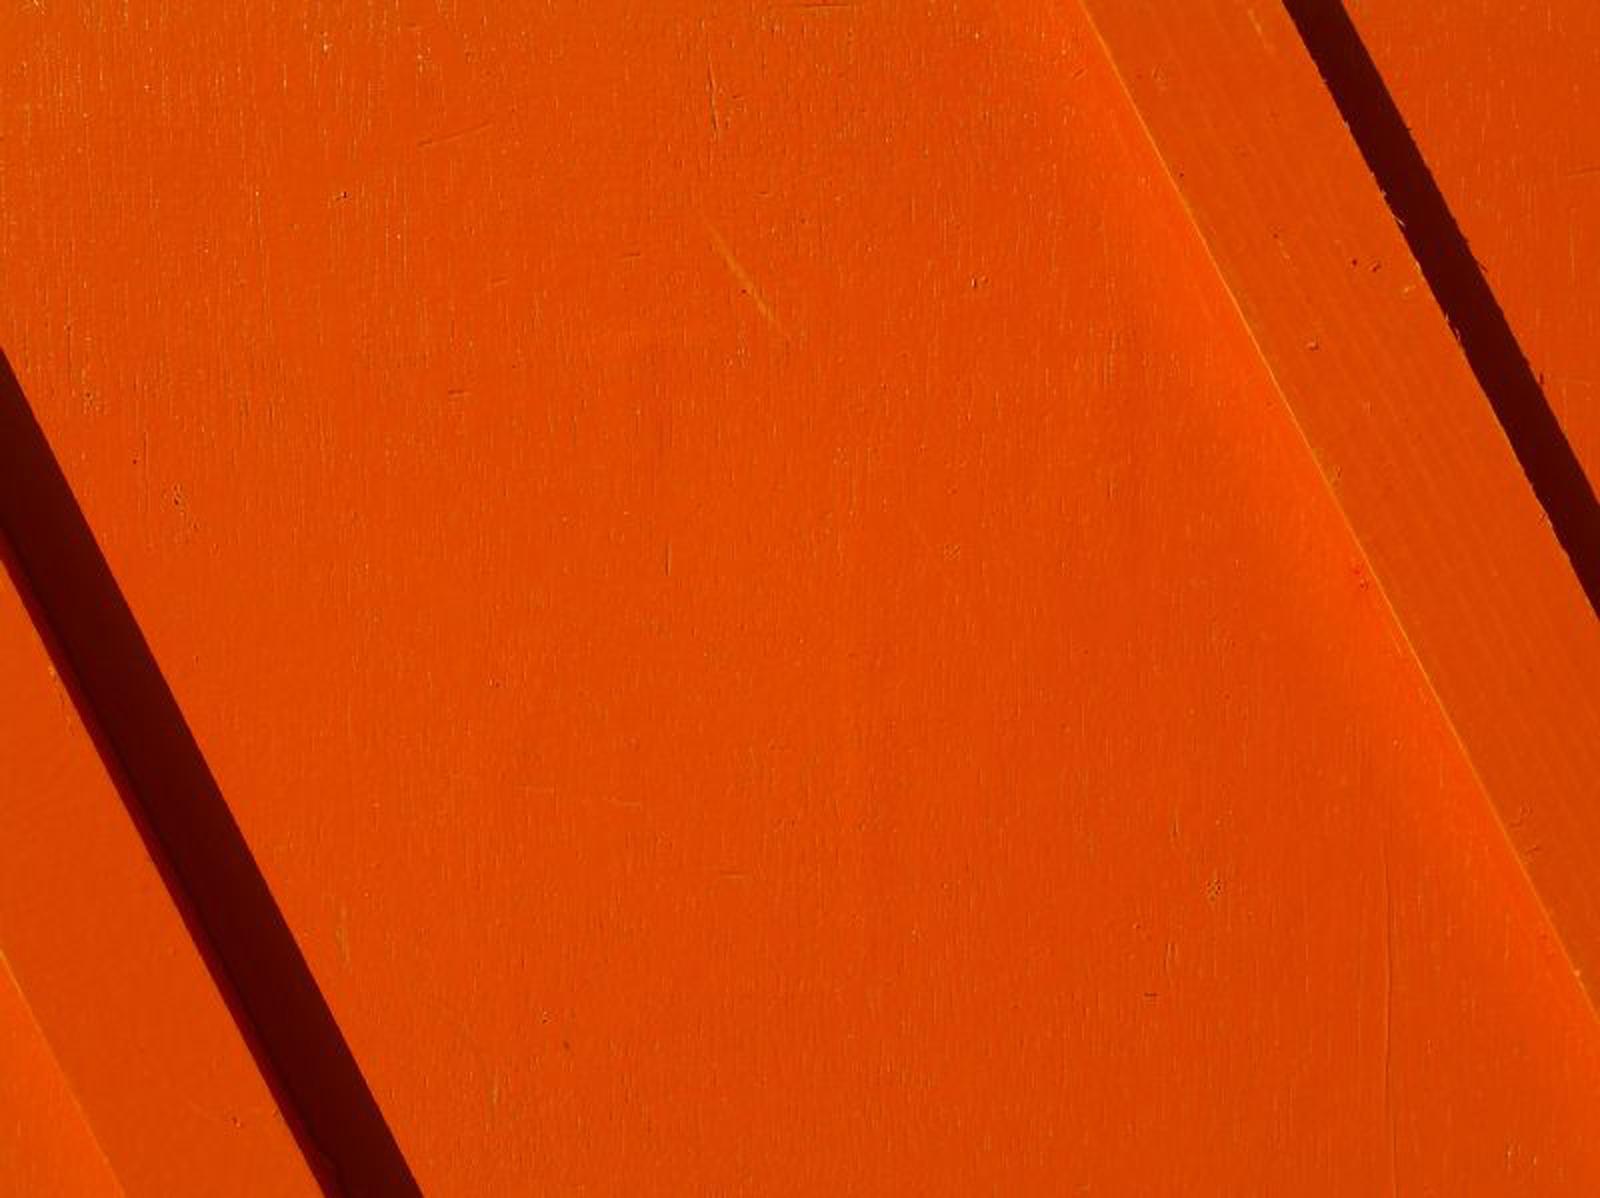 orange_shadow_5.jpg